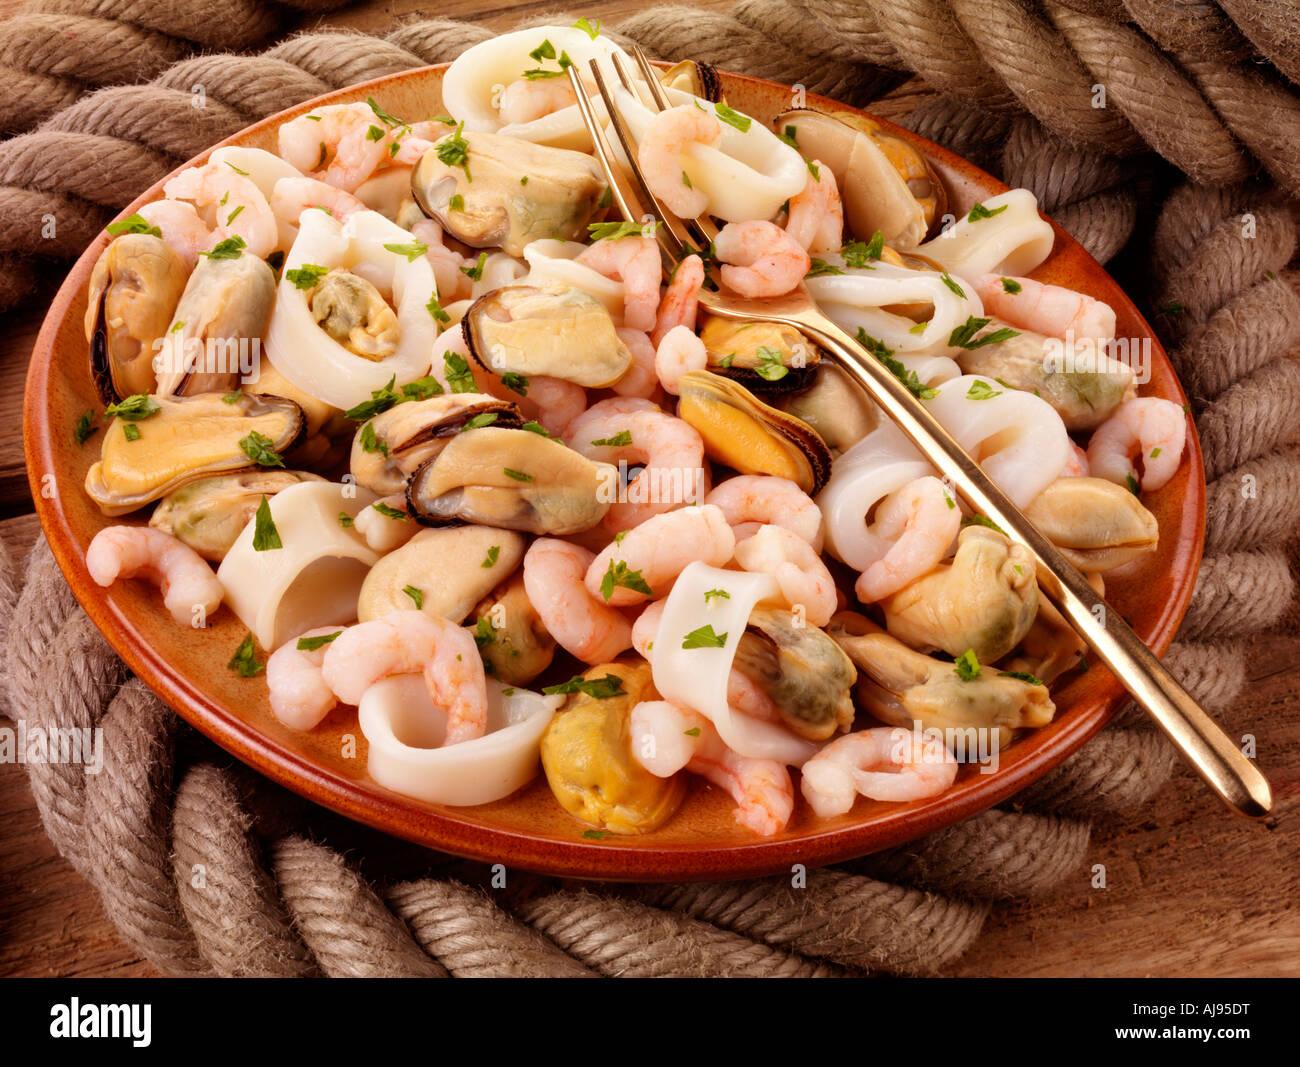 MIXED SEAFOOD MEDLEY Stock Photo - Alamy